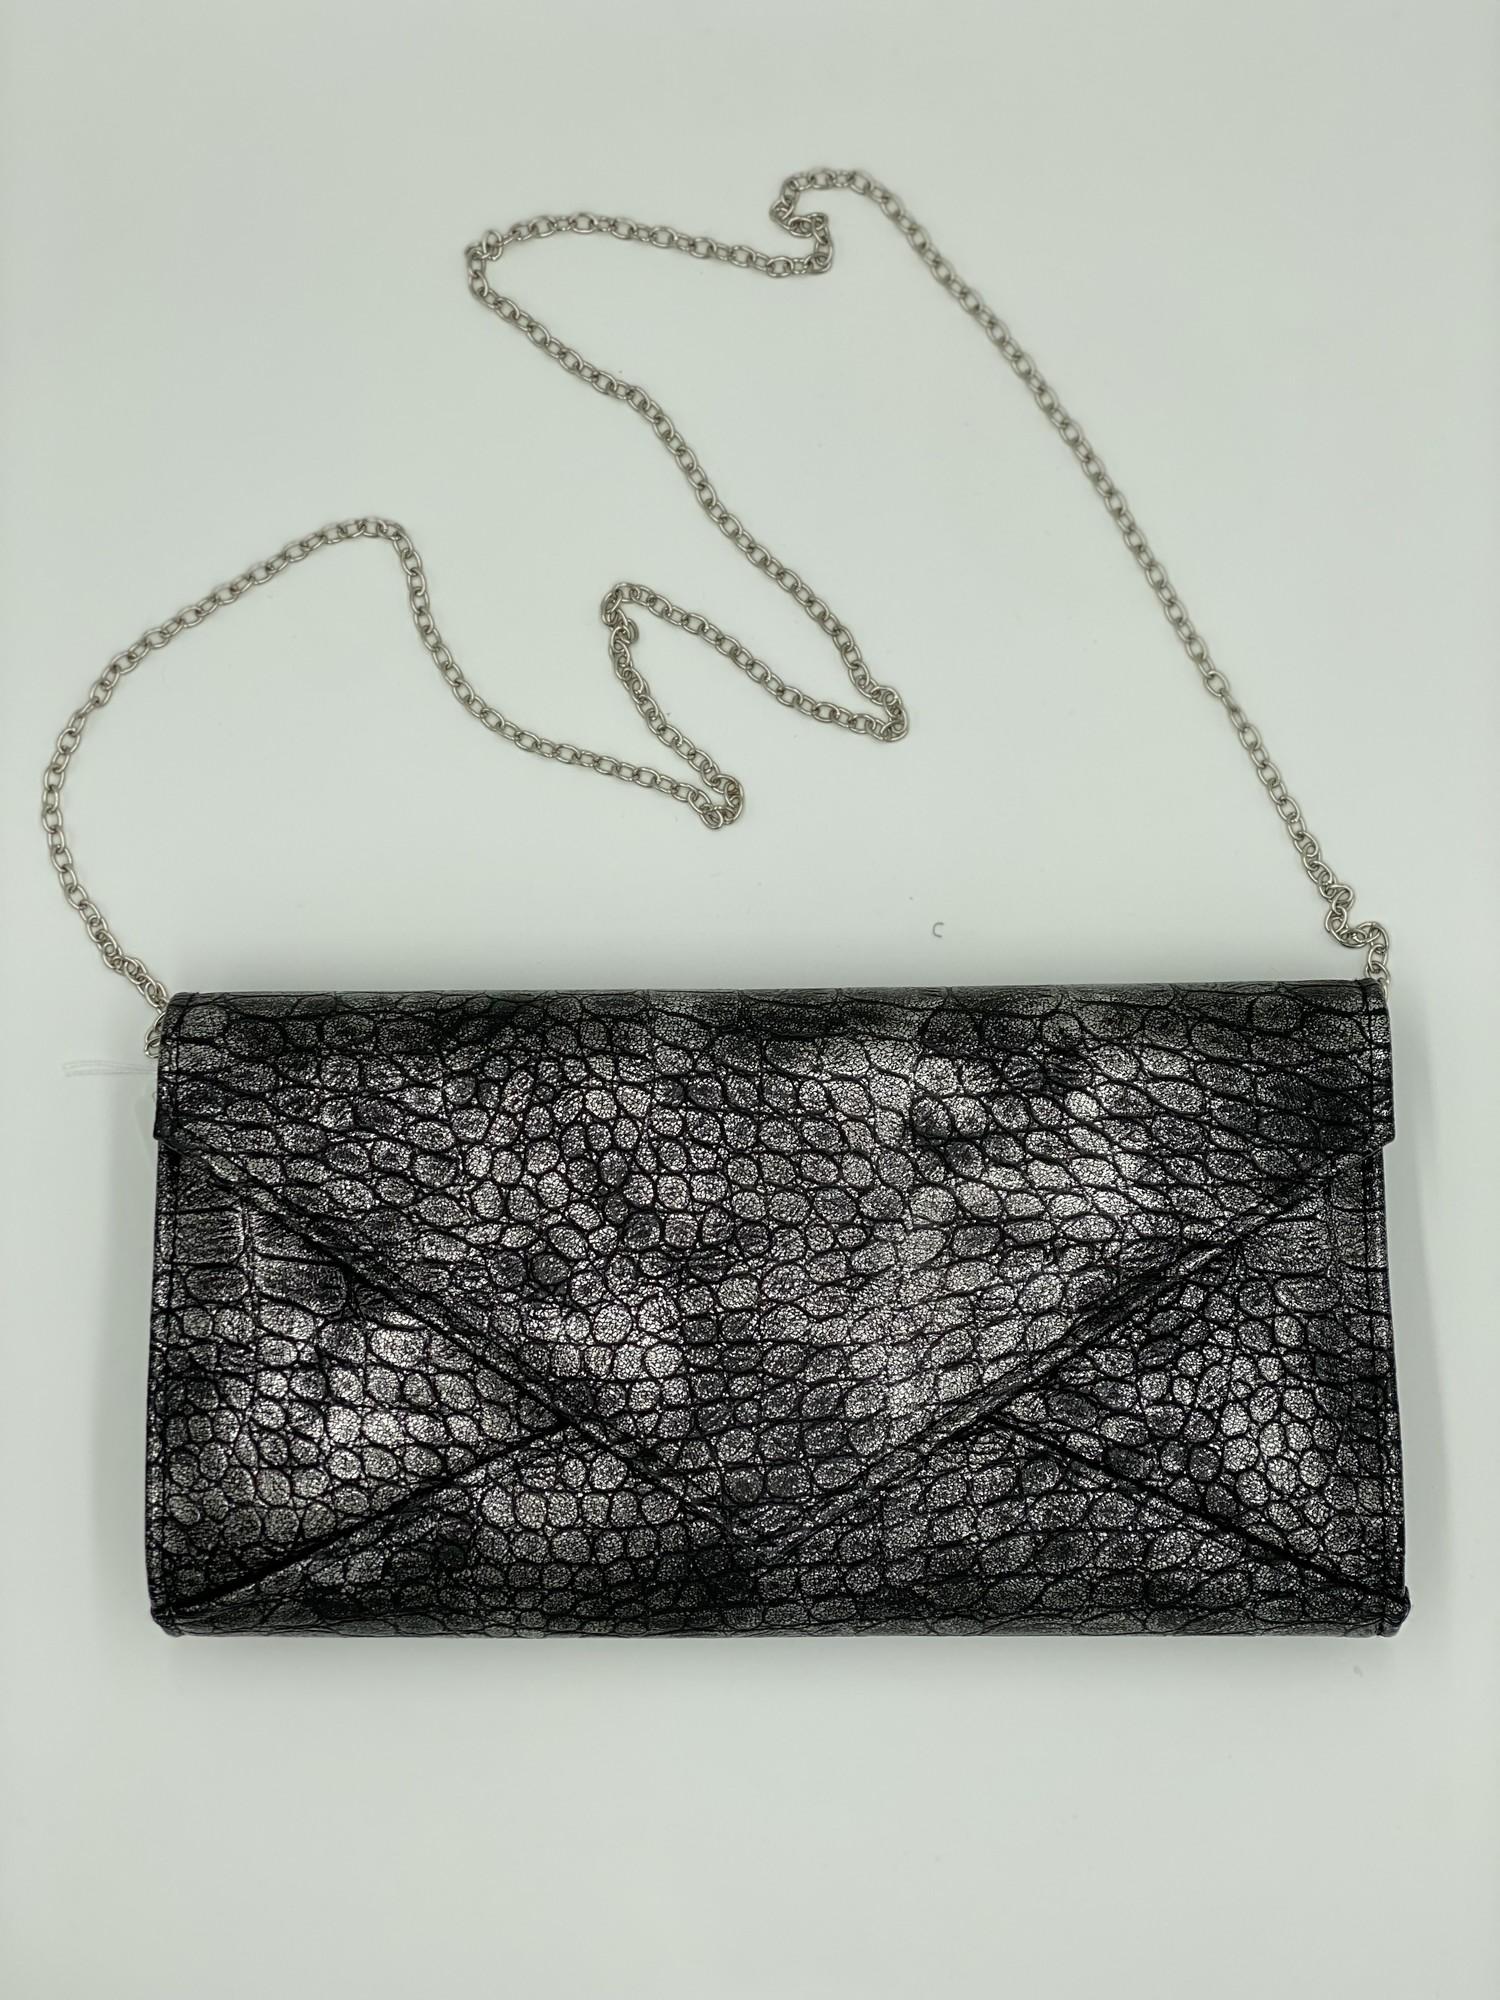 Cr Evening Bag, Grey, Size: None